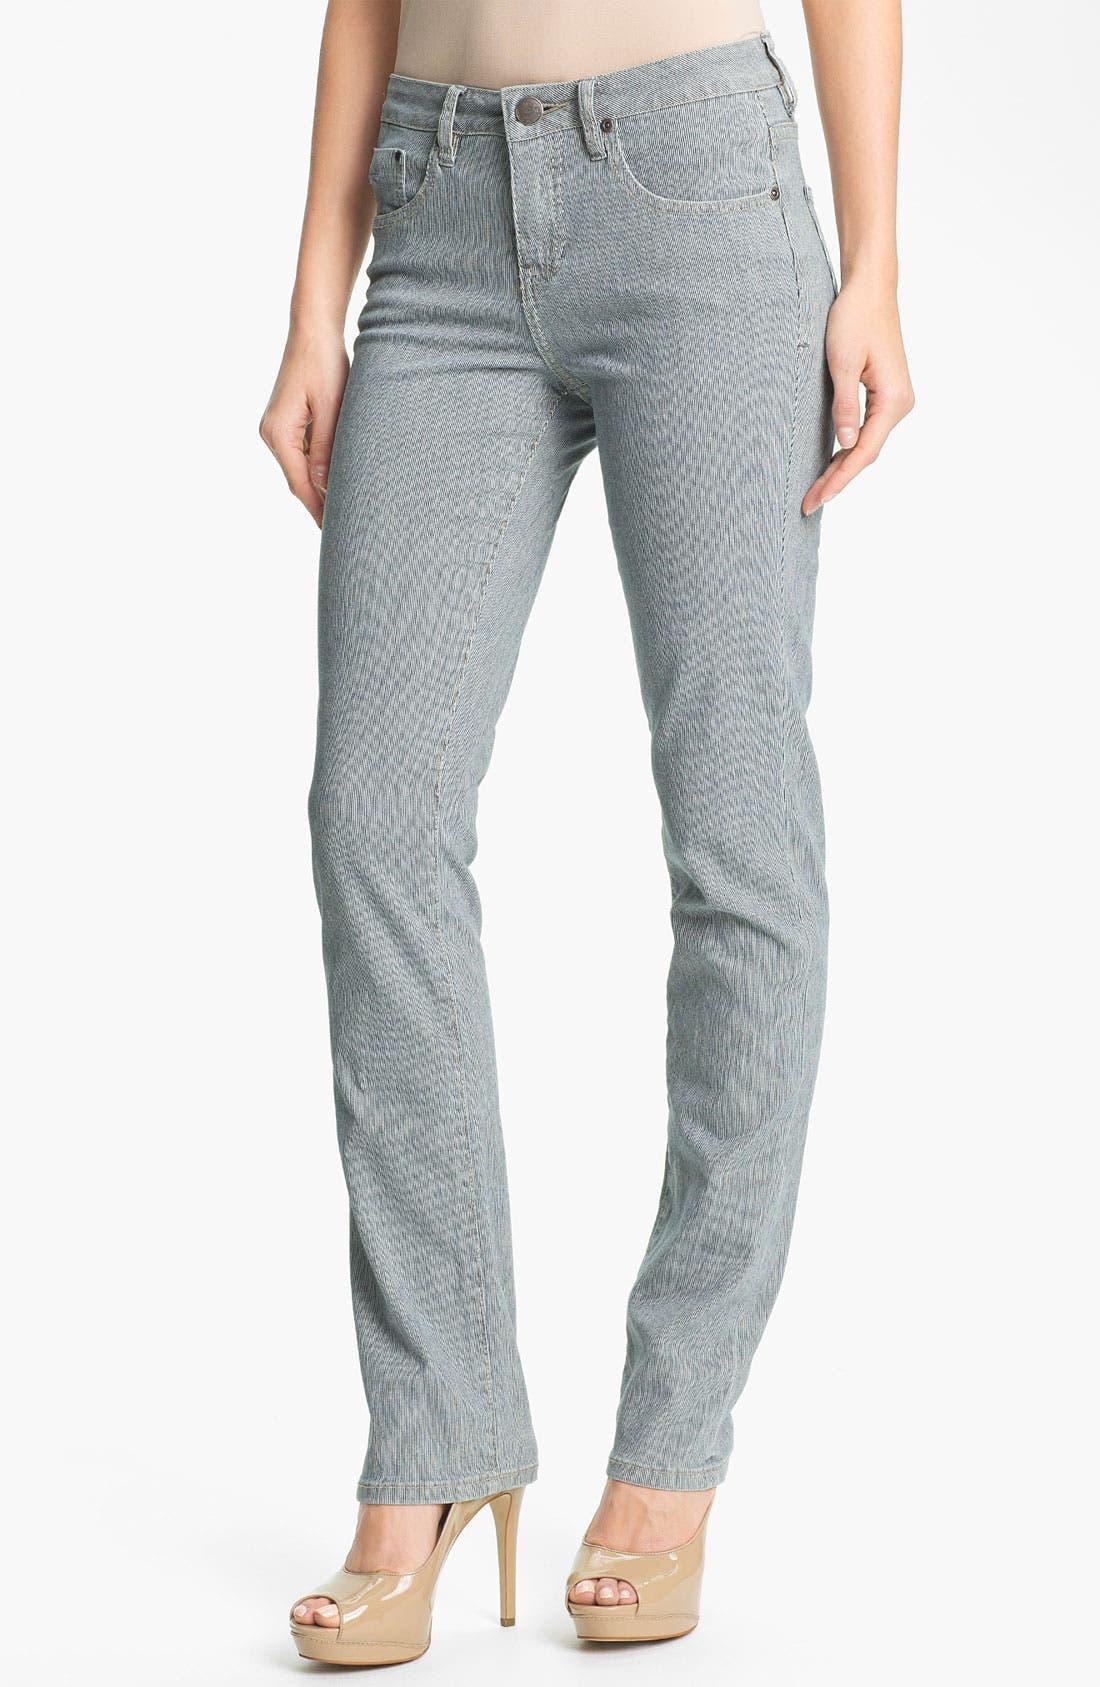 Alternate Image 1 Selected - Jag Jeans 'Jackson' Stripe Straight Leg Jeans (Petite)